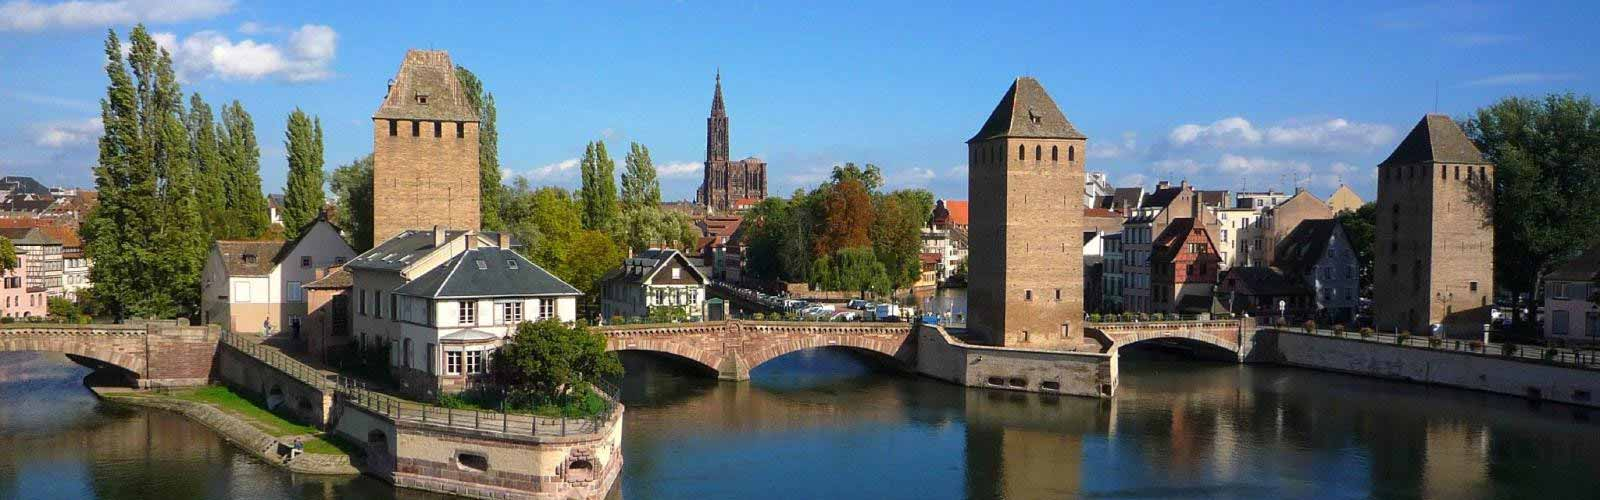 Strasbourghotels Net Hotels Avec Chambres Insonorisees